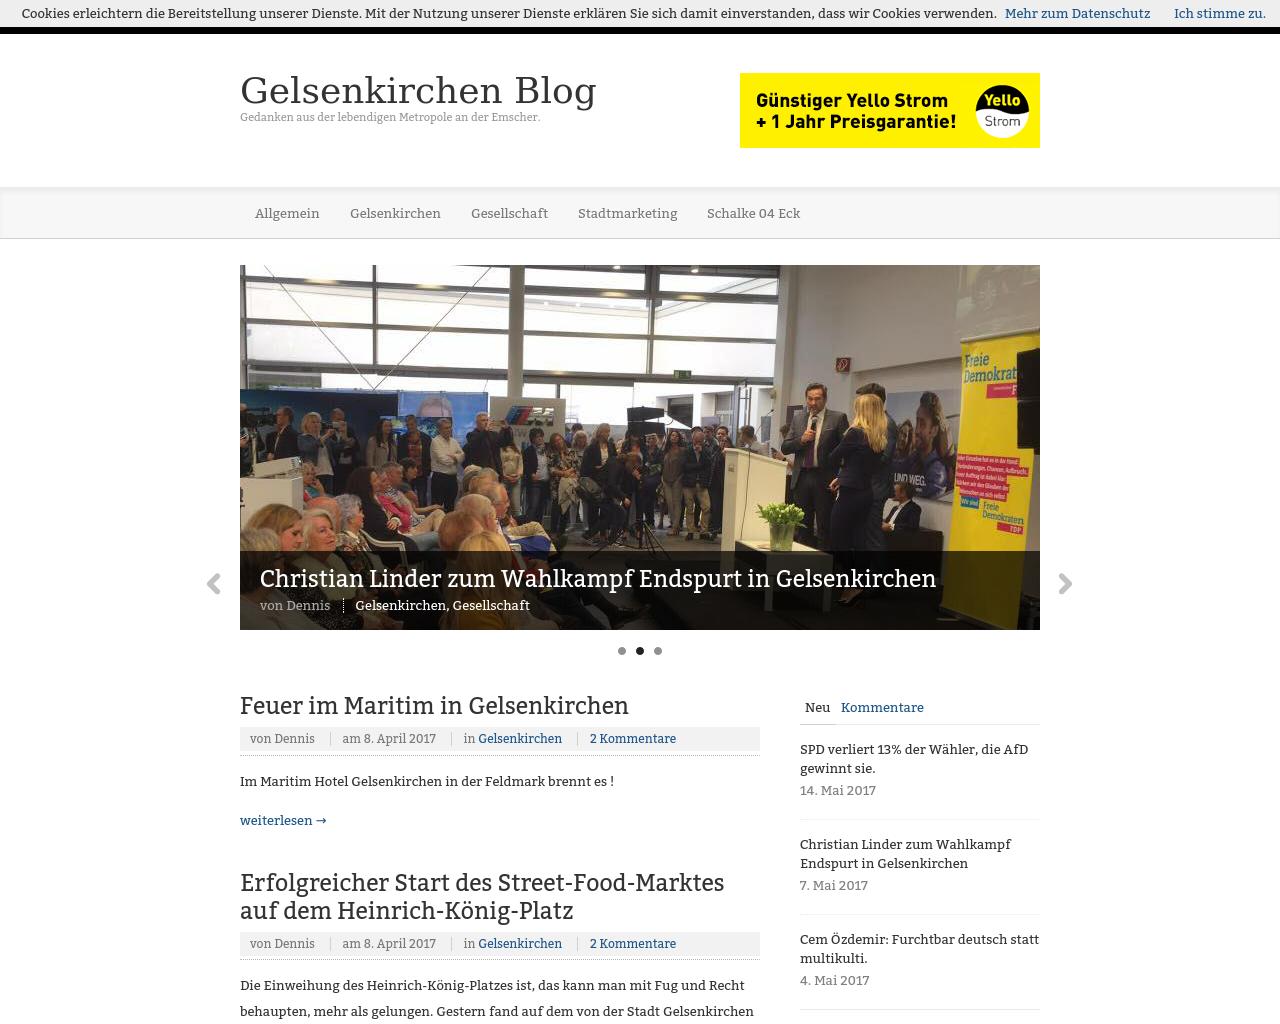 Gelsenkirchen-Blog-Advertising-Reviews-Pricing